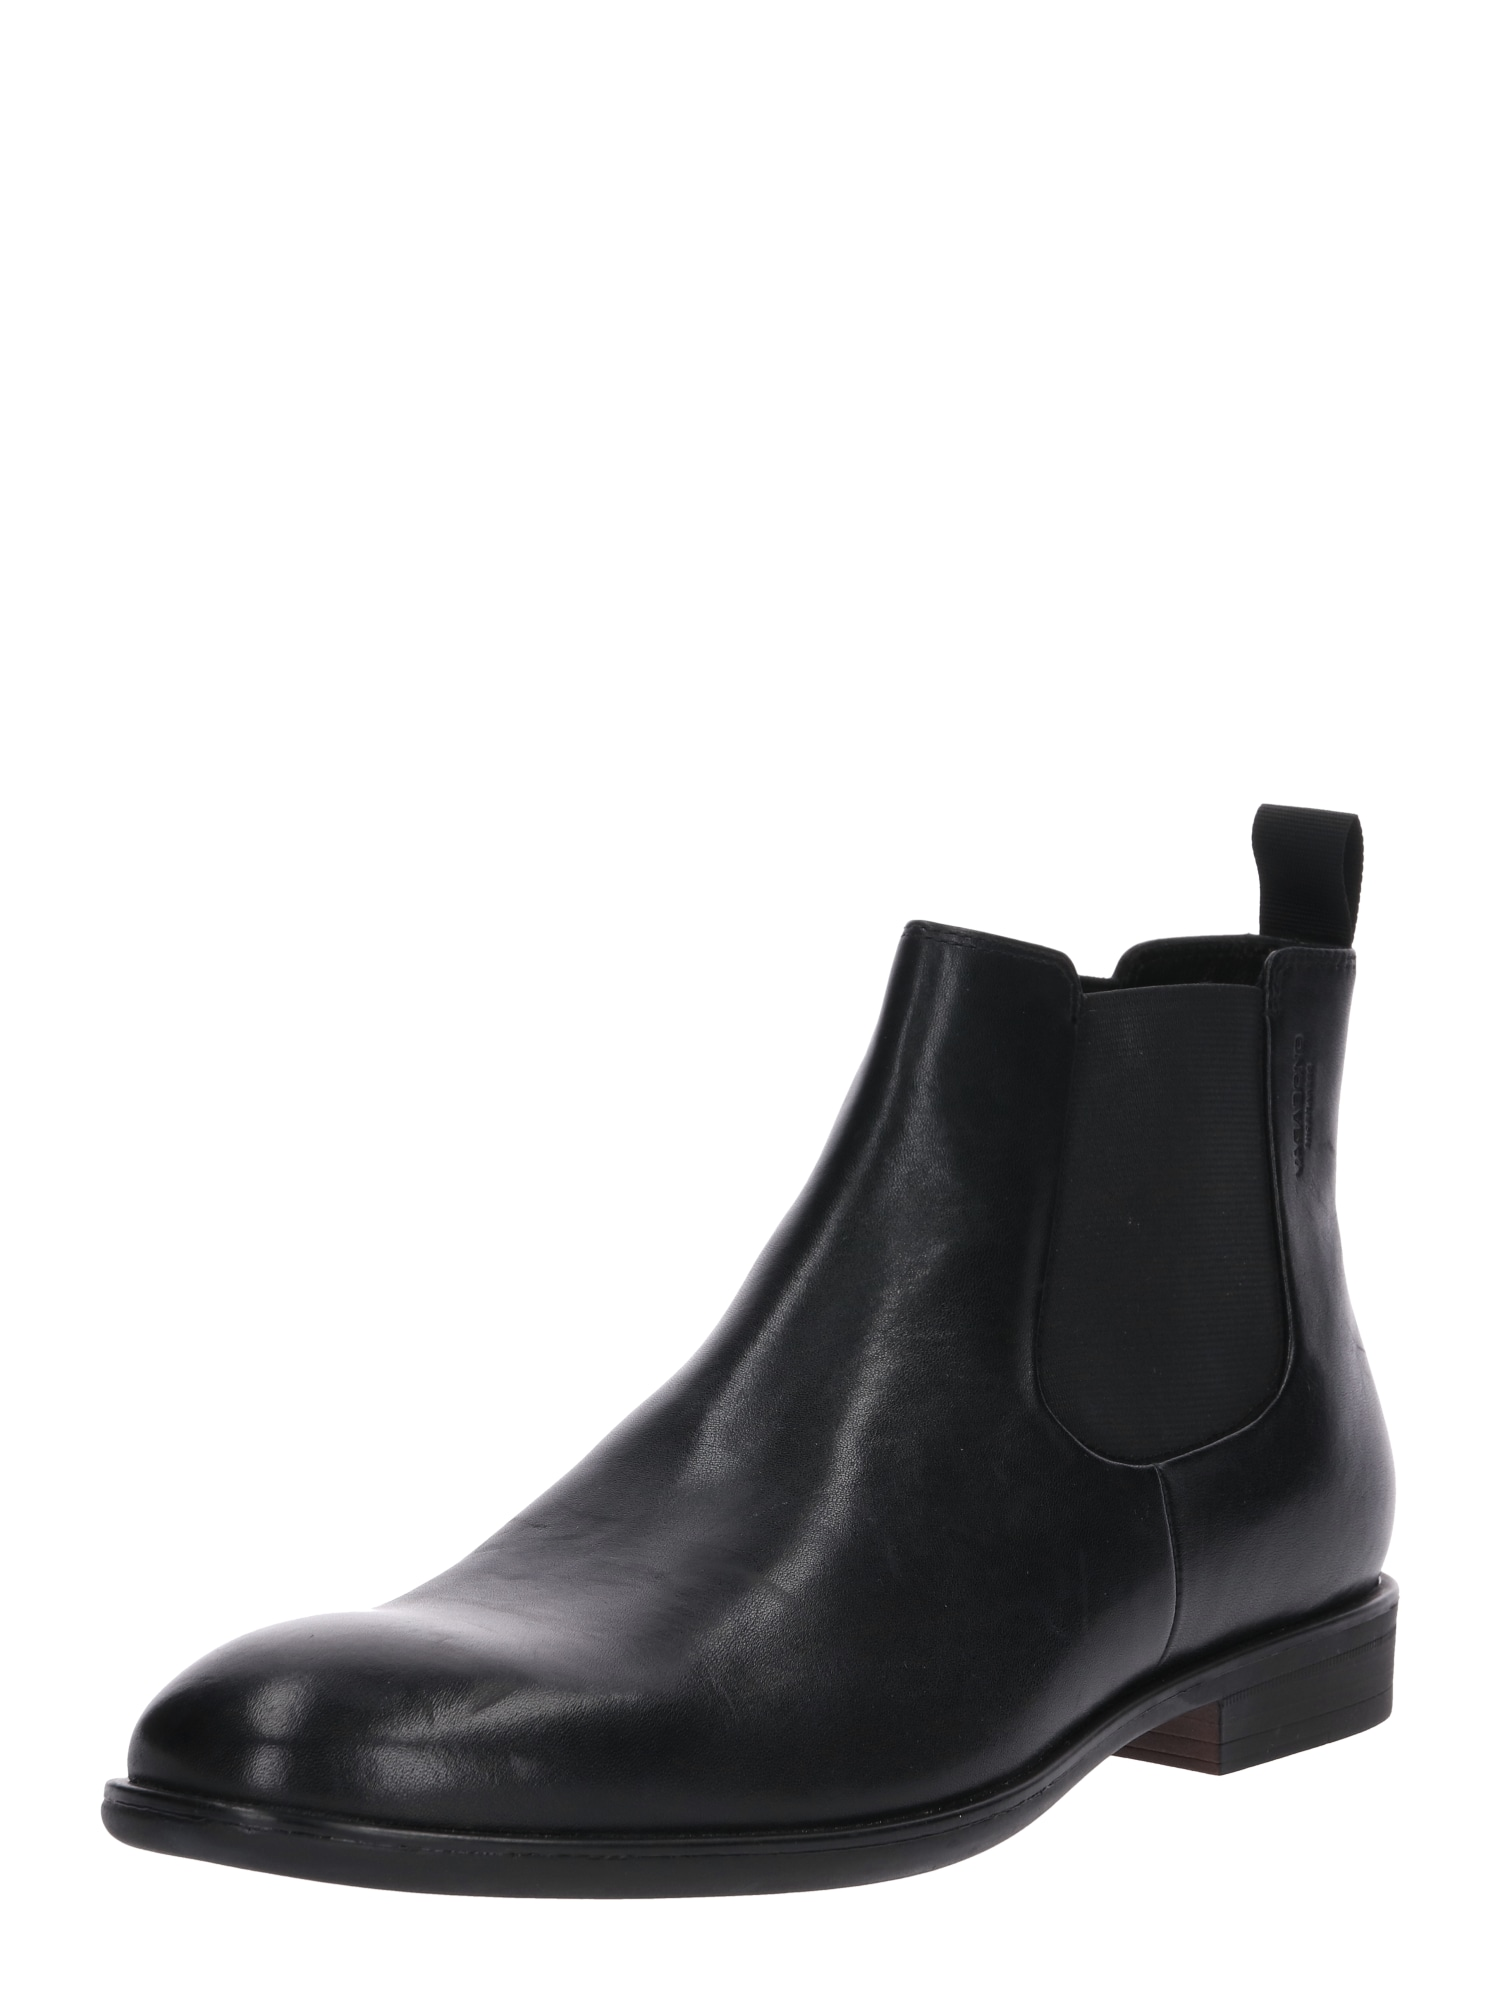 Stiefel 'Harvey' | Schuhe > Boots > Stiefel | VAGABOND SHOEMAKERS